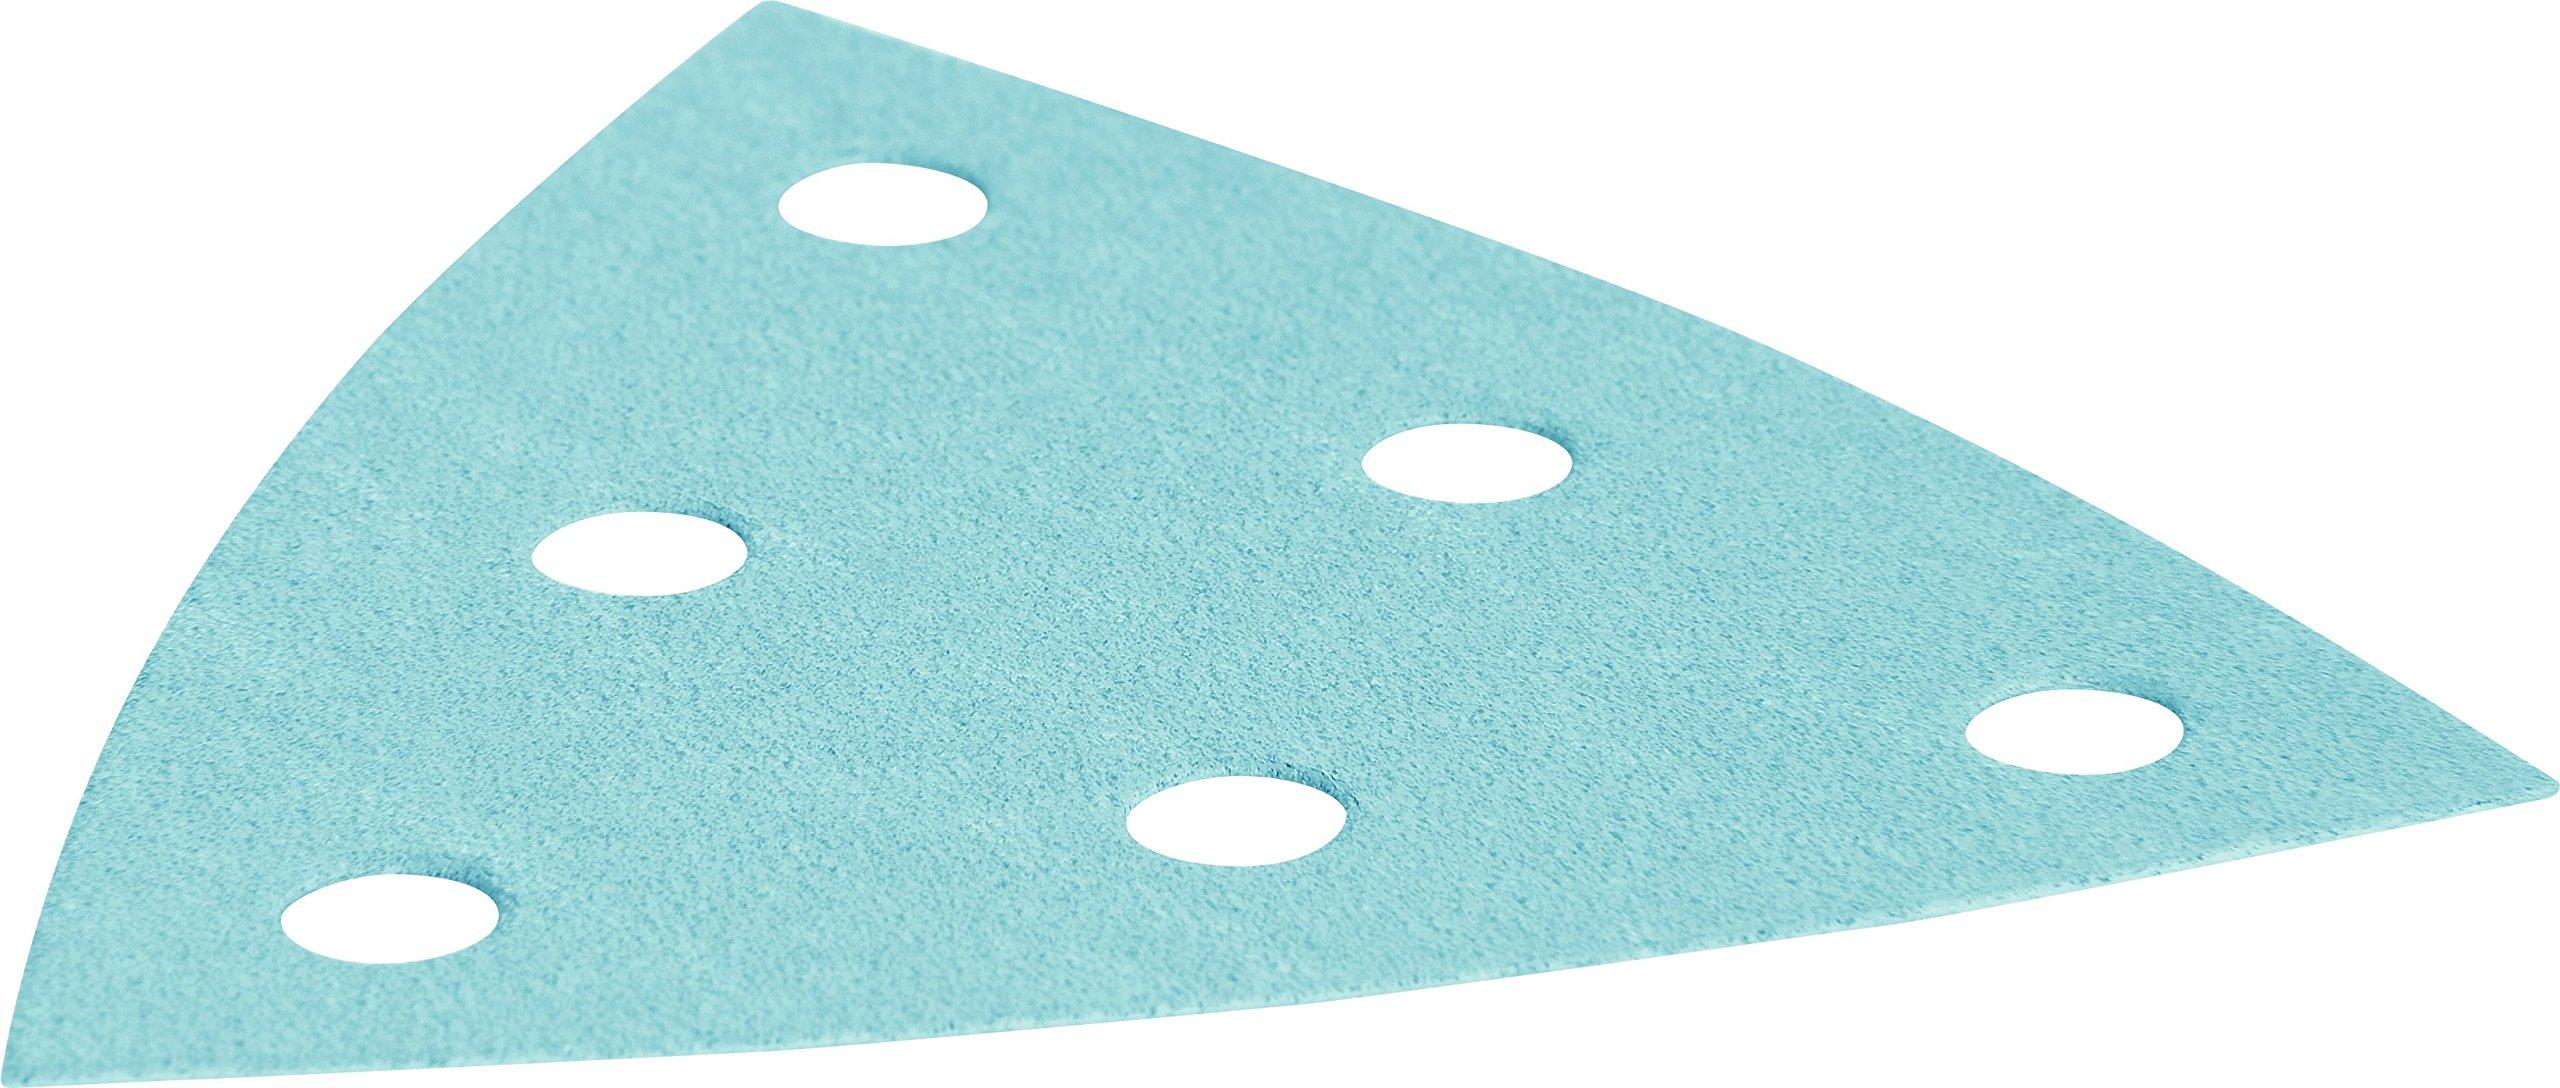 Festool 497398 P240 Grit, Granat Abrasives, Pack of 100